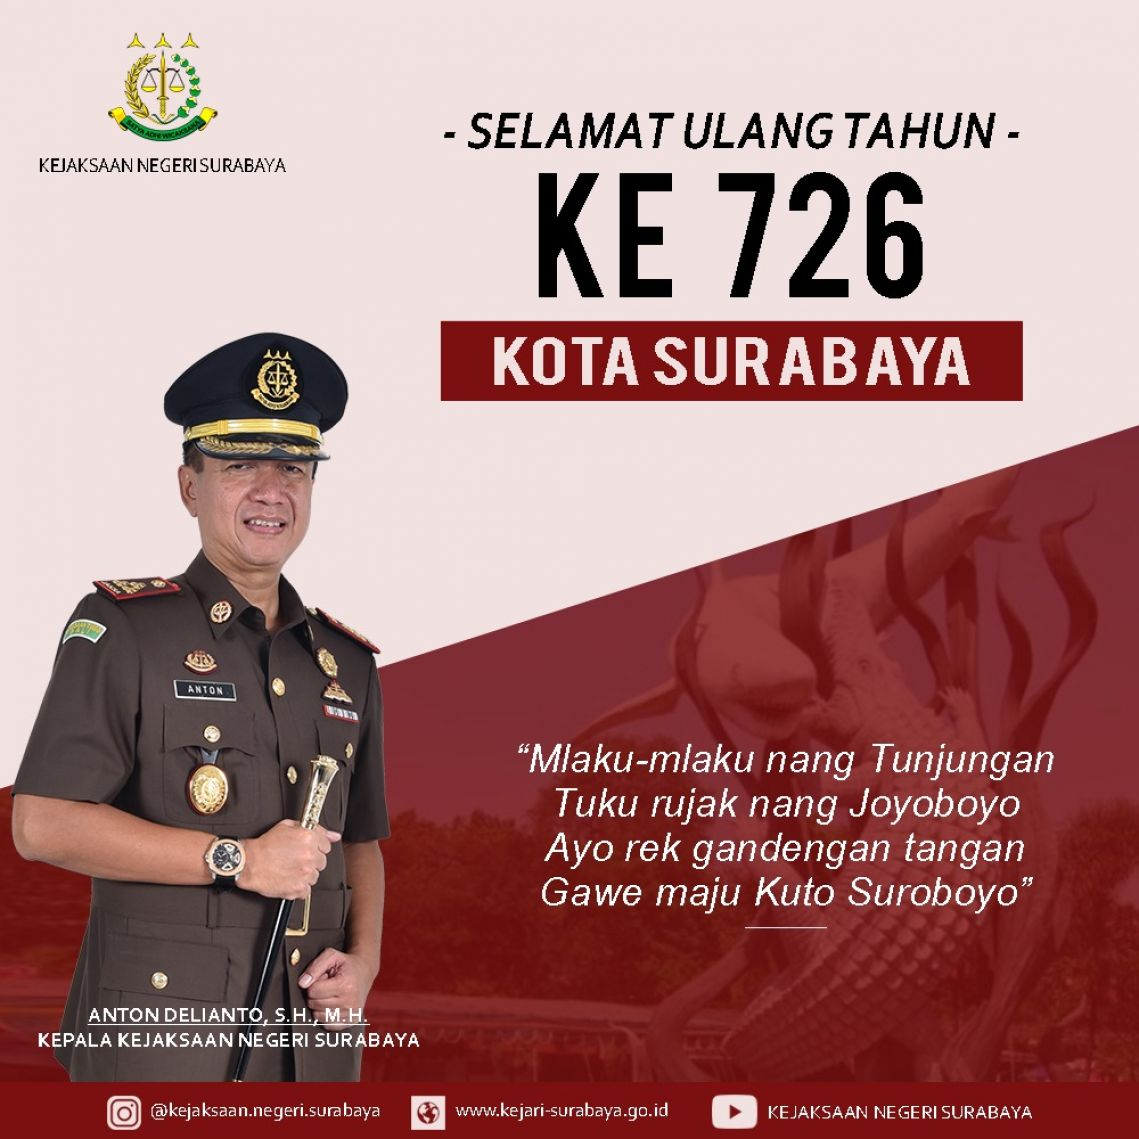 Hari Jadi Kota Surabaya ke 726 31-05-2019